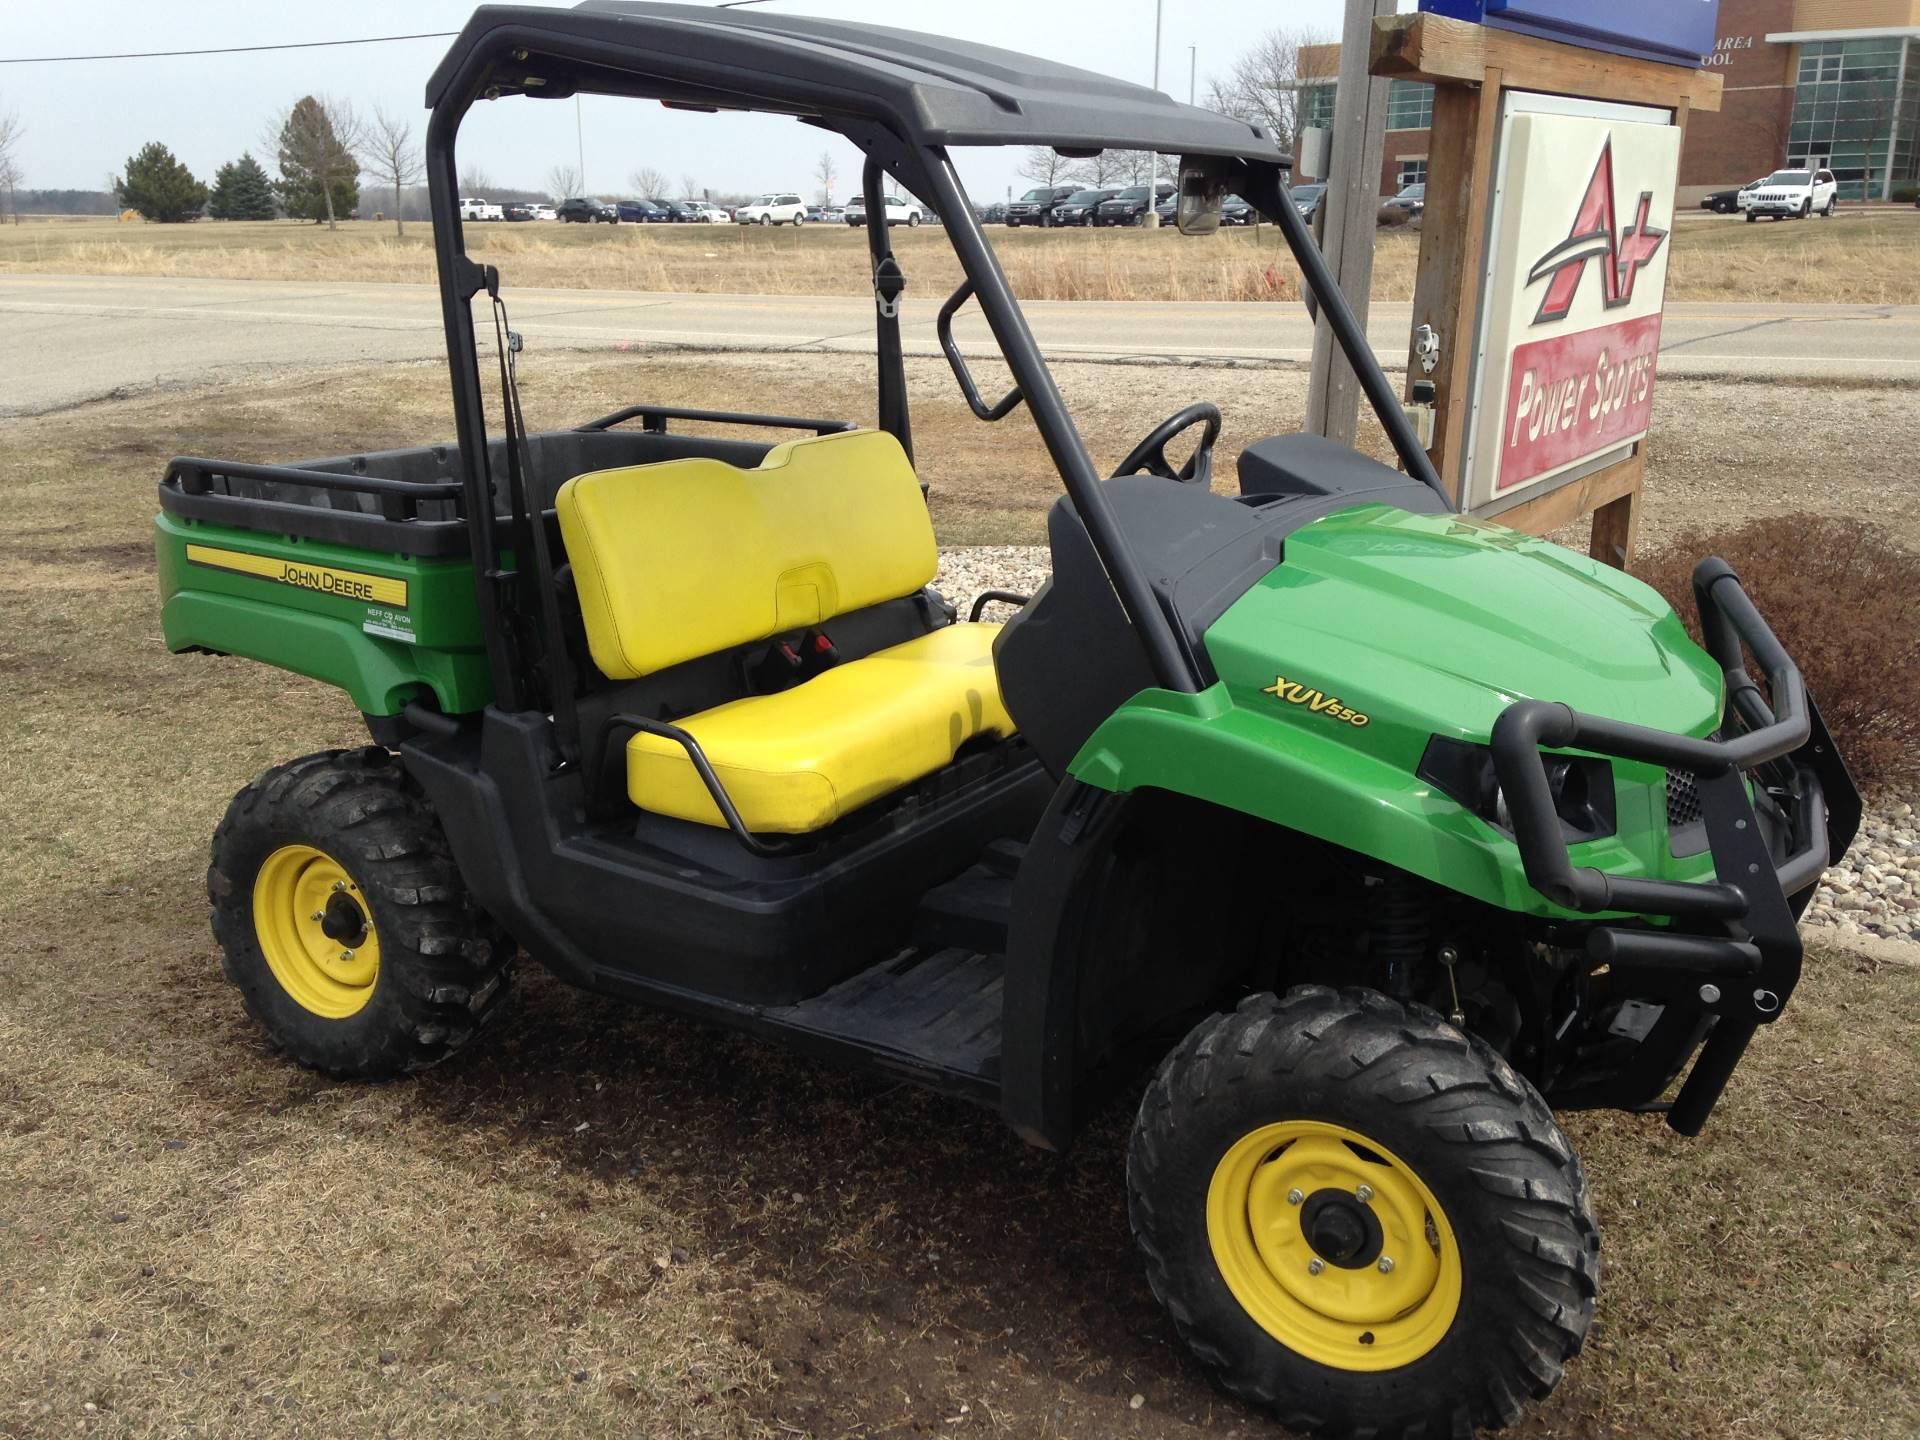 2014 Gator XUV 550